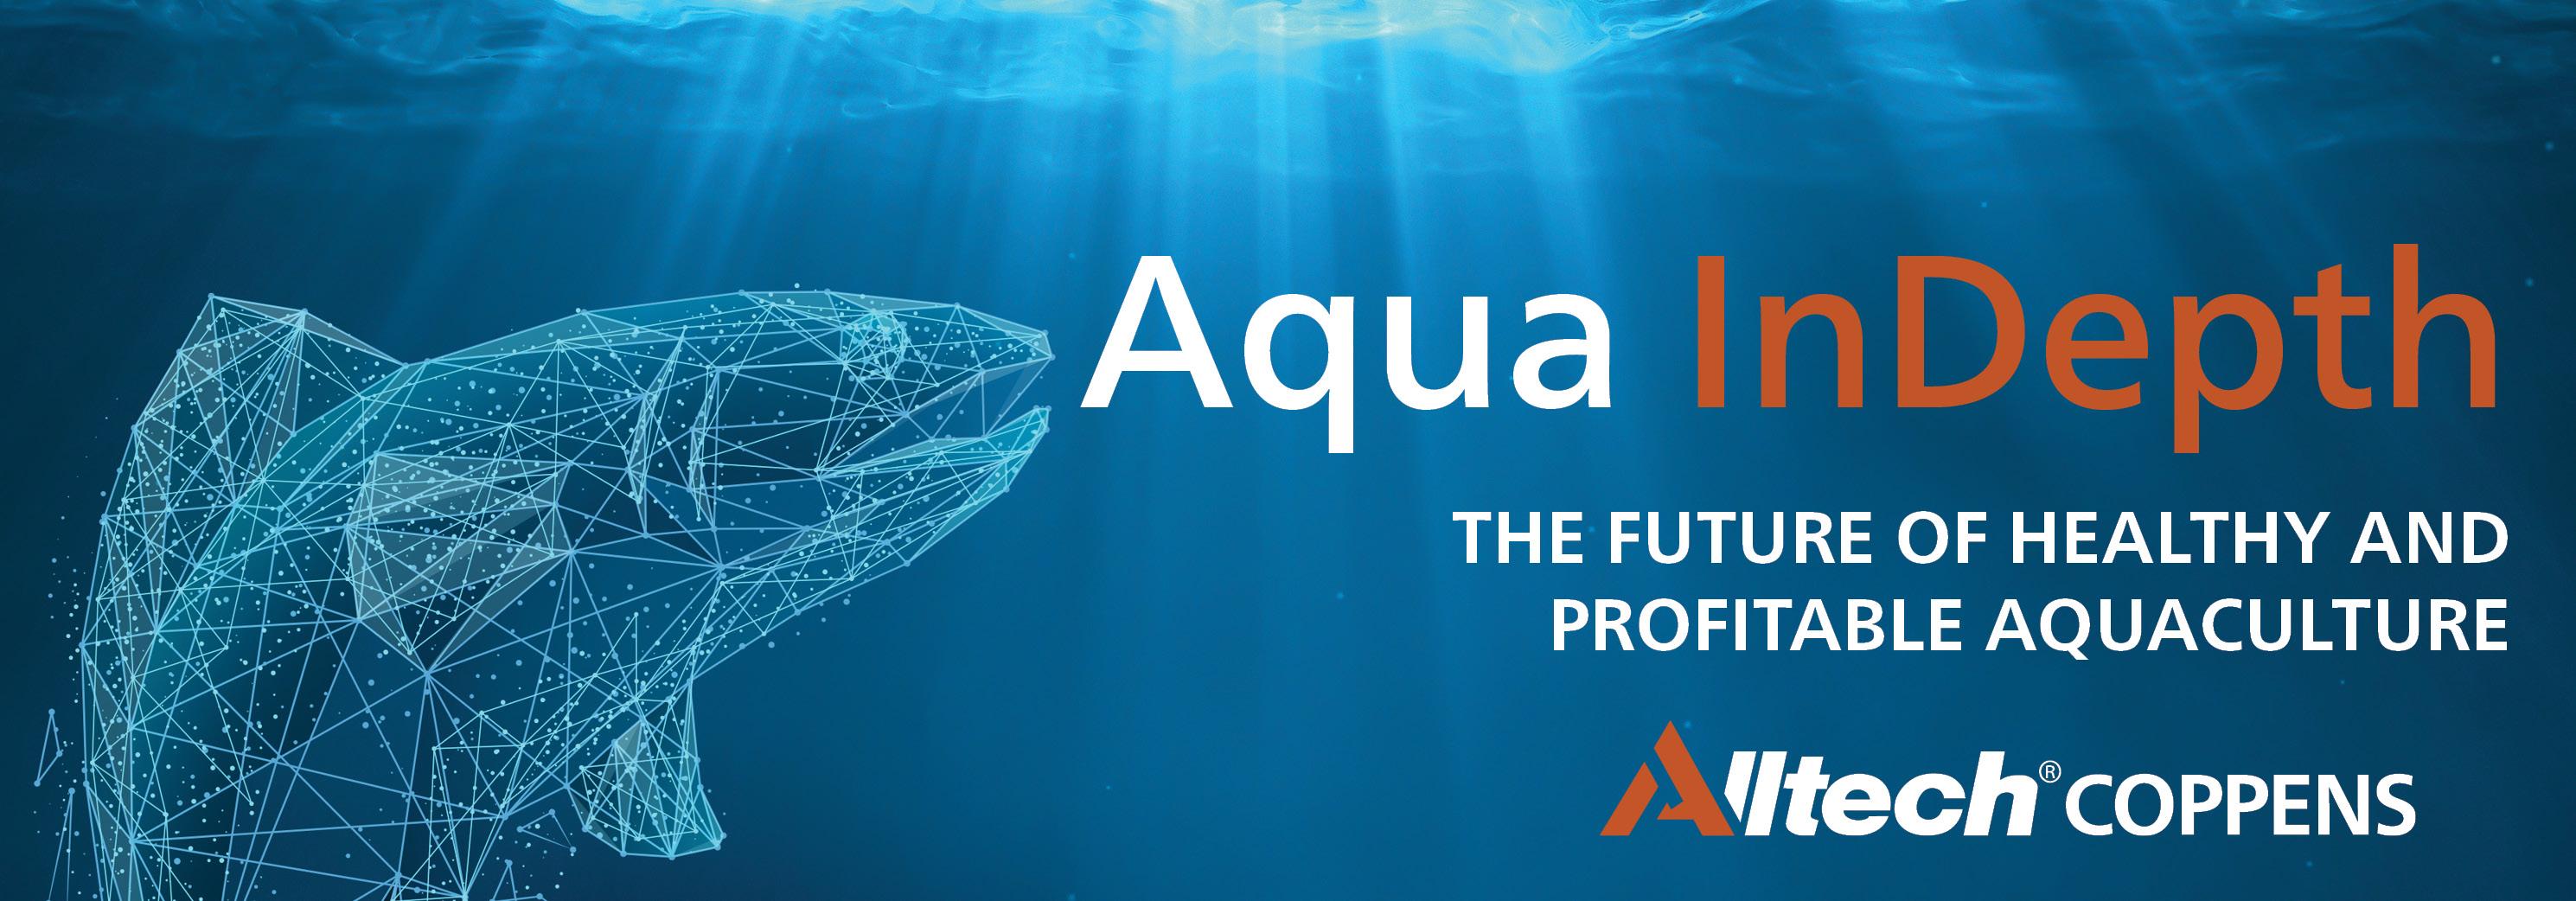 8681_ Aqua Indepth landing page header with logo